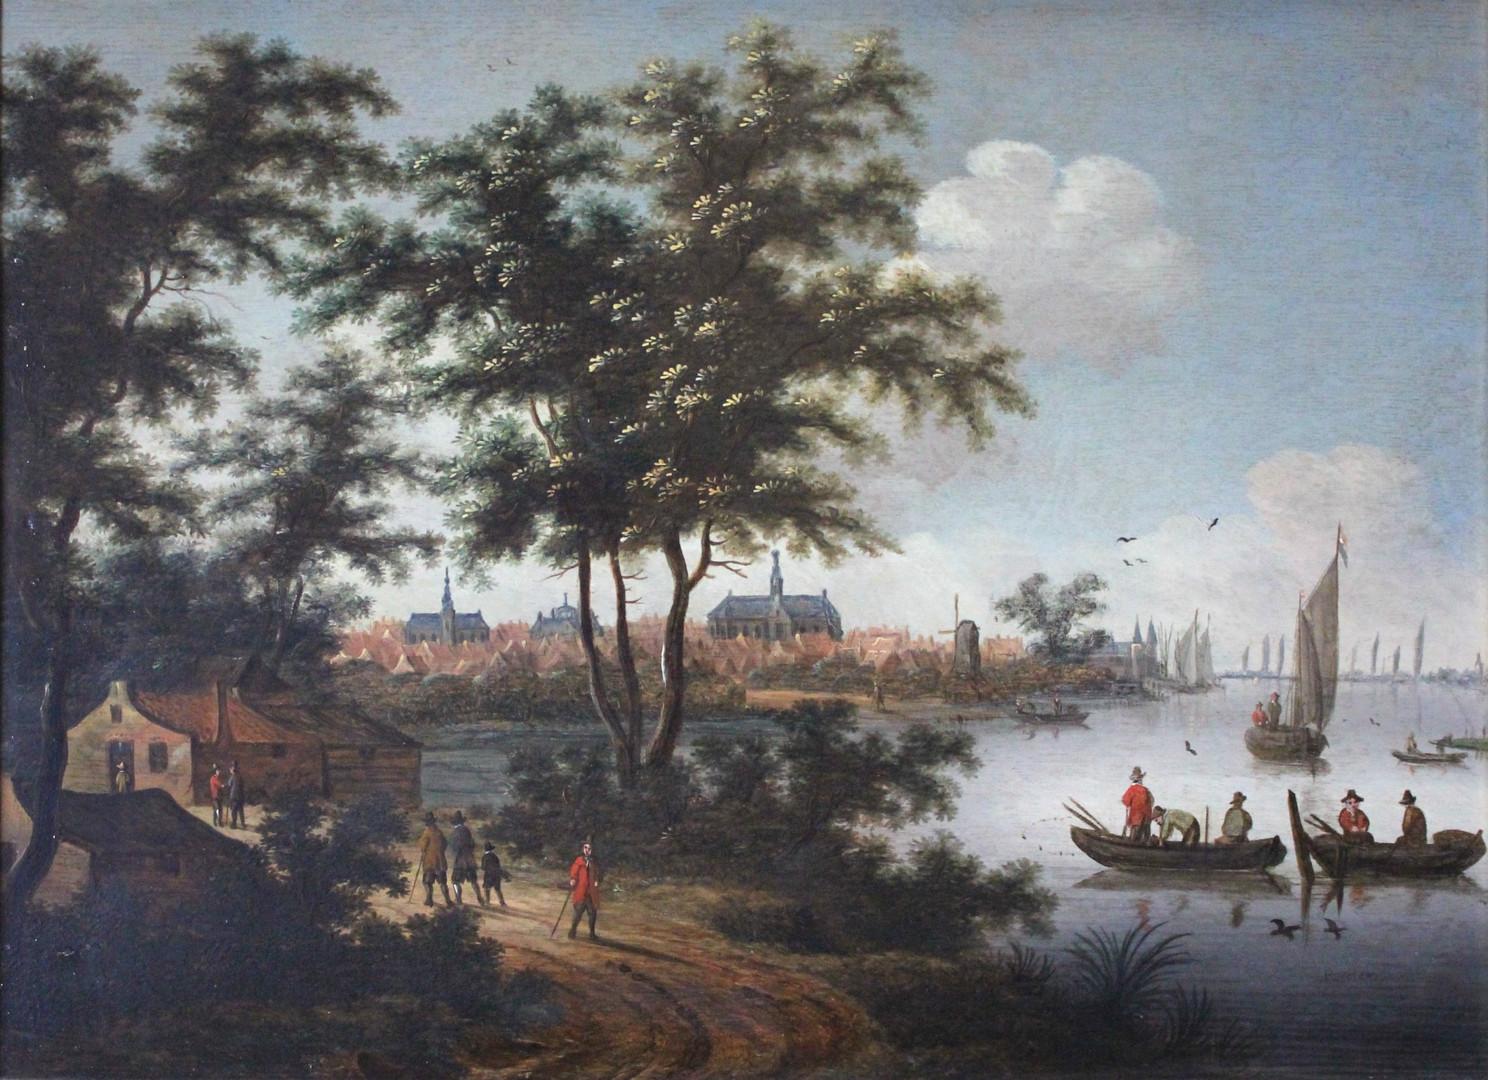 Willem Dalens, 'Haerlempje'